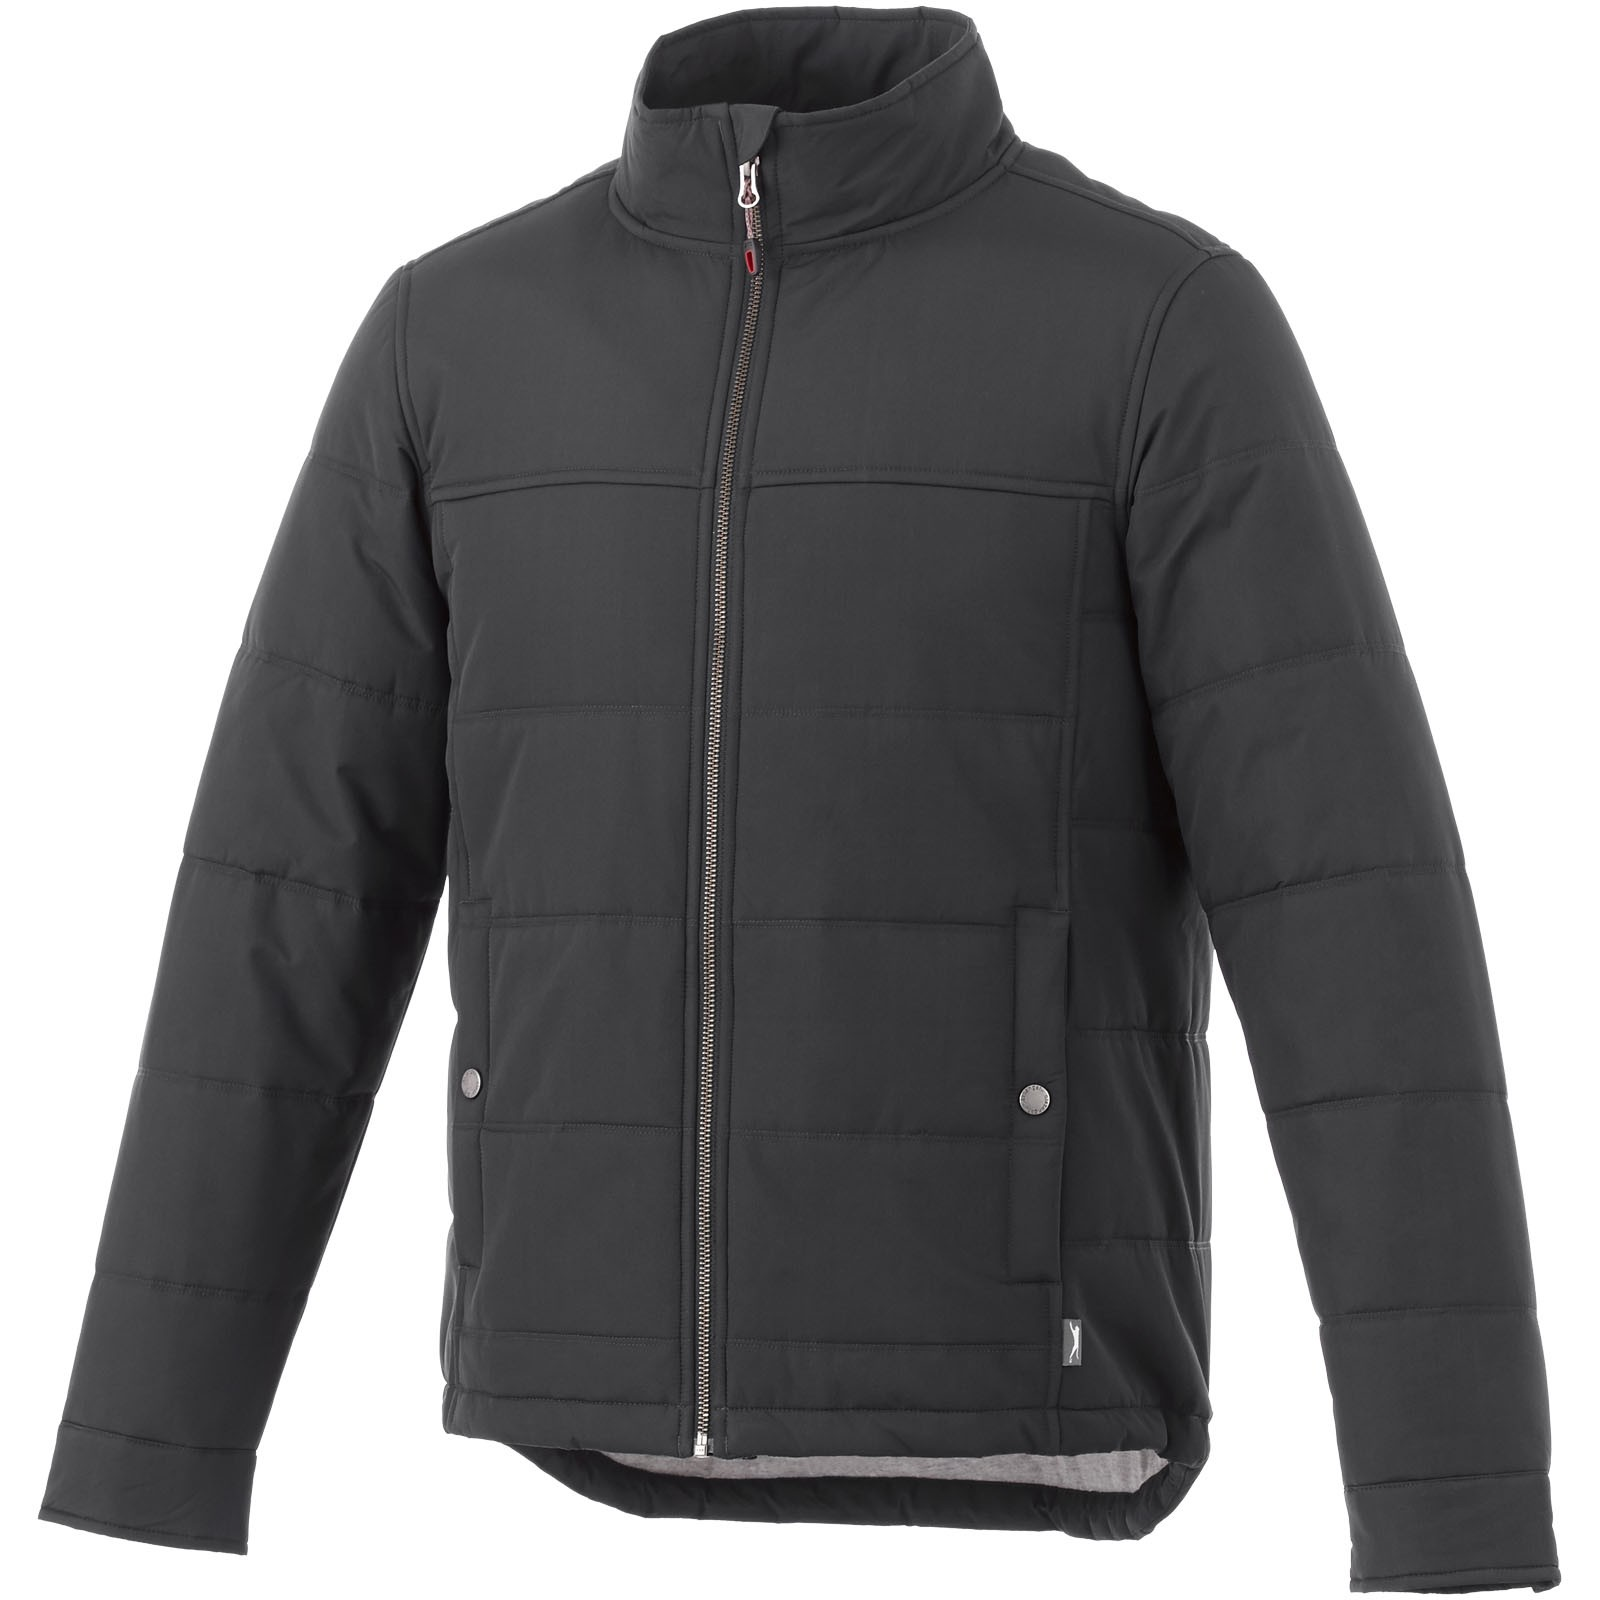 Bouncer insulated jacket - Grey smoke / S